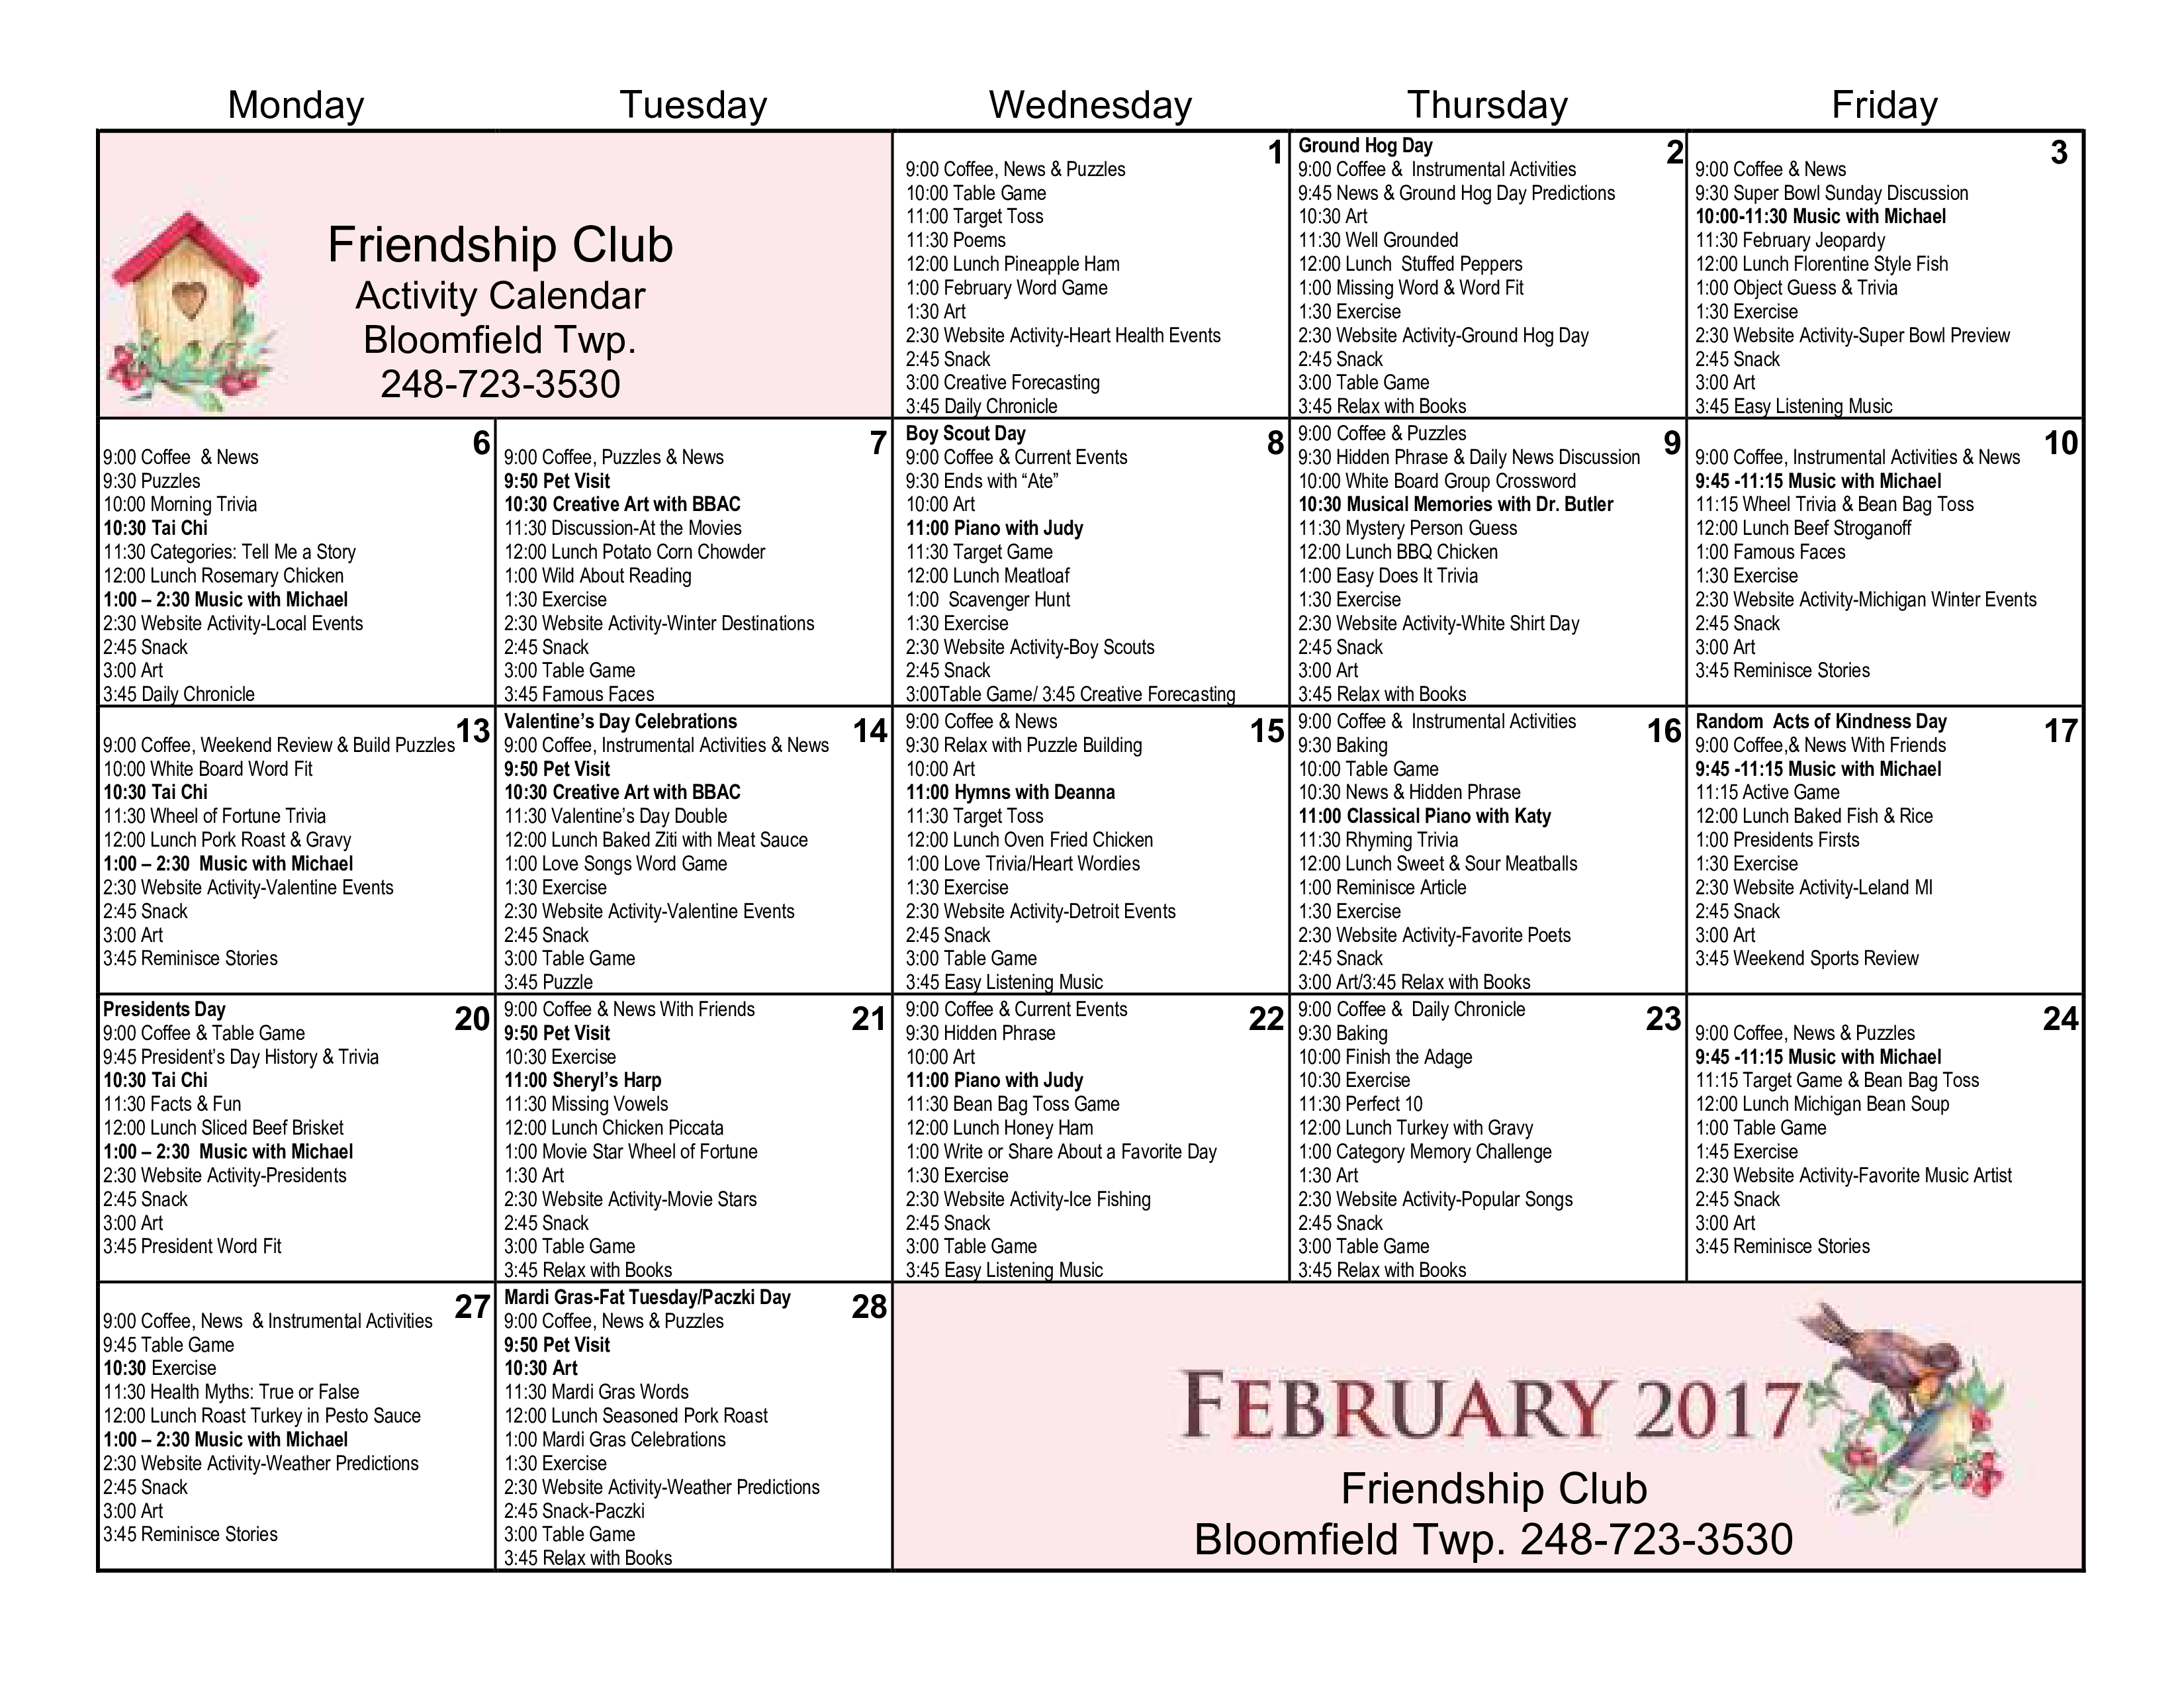 Free Club Activity Calendar Templates At Allbusinesstemplates Com